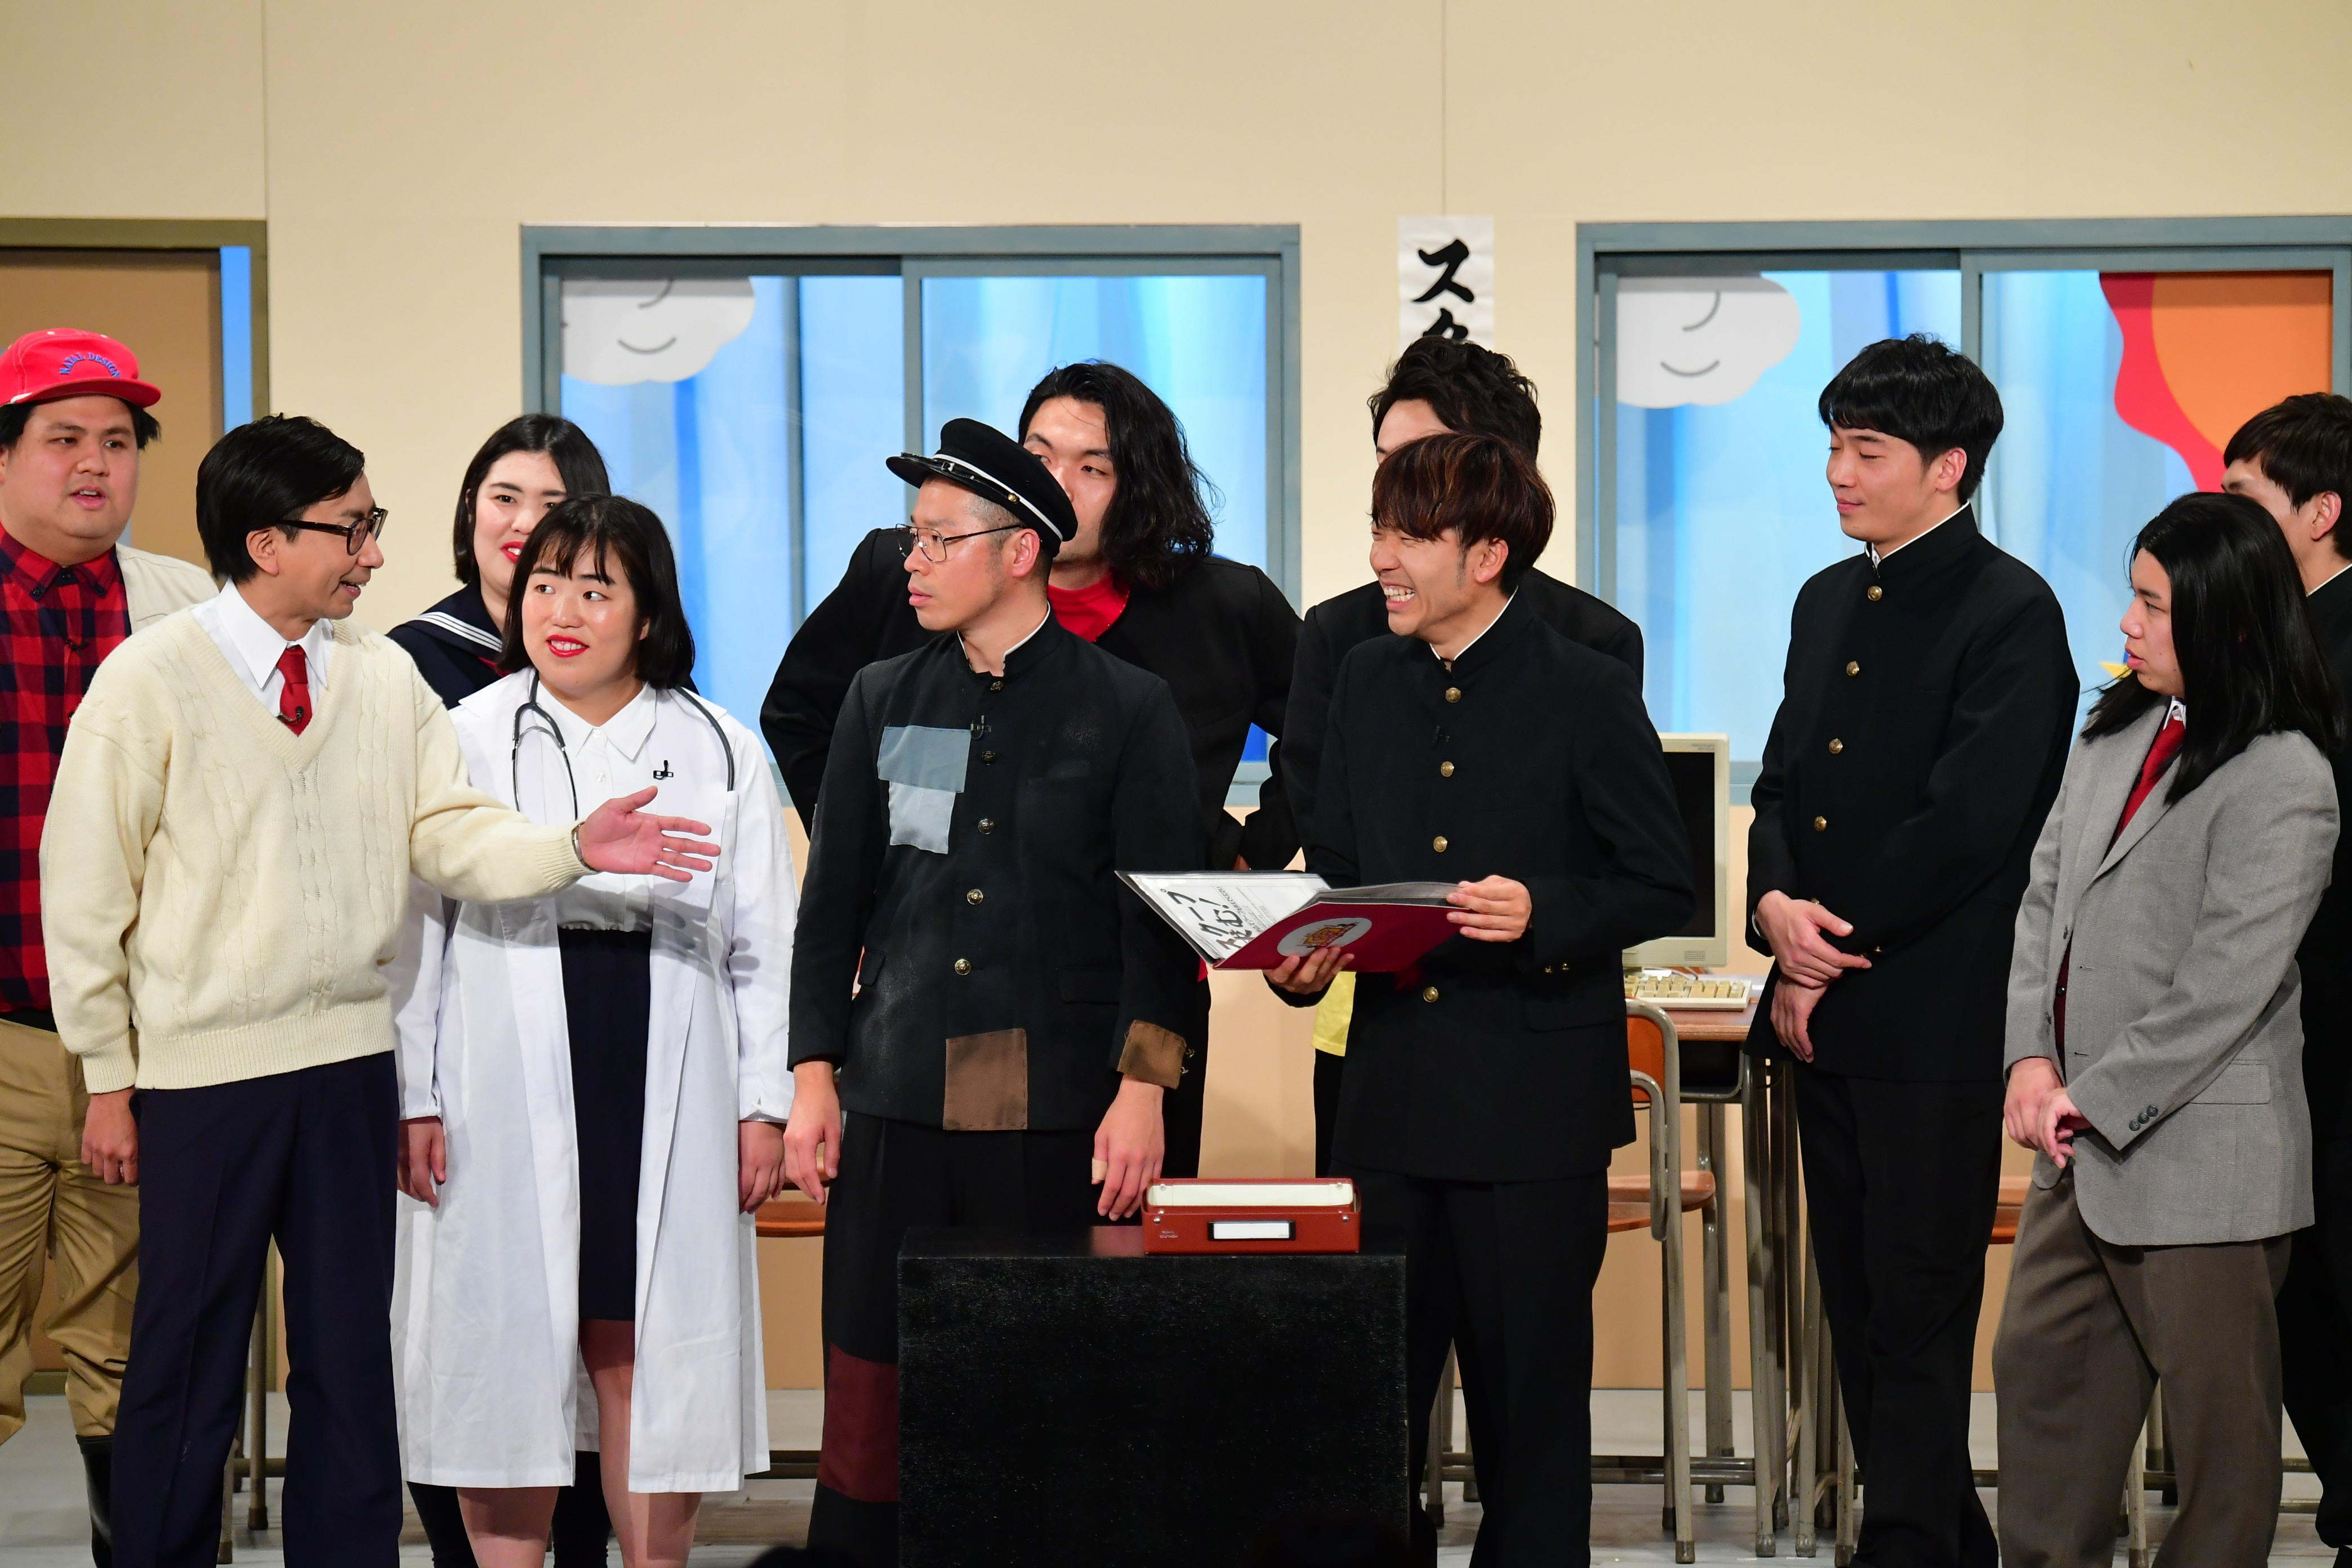 http://news.yoshimoto.co.jp/20181220091046-035d2d123b40338ad46f05aae737b8fefe712e53.jpg